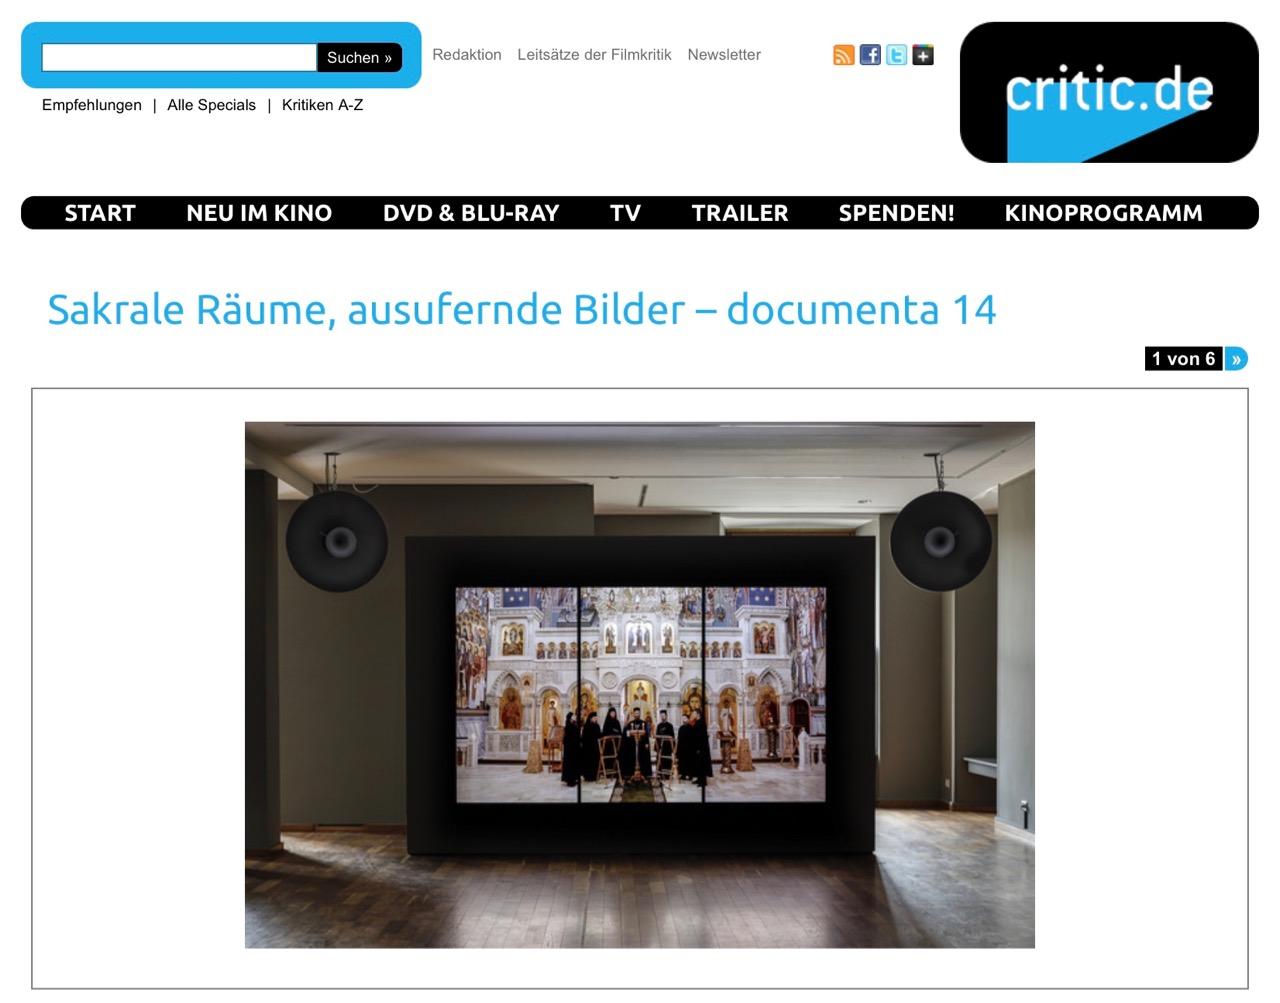 Sakrale Räume, ausufernde Bilder – documenta 14